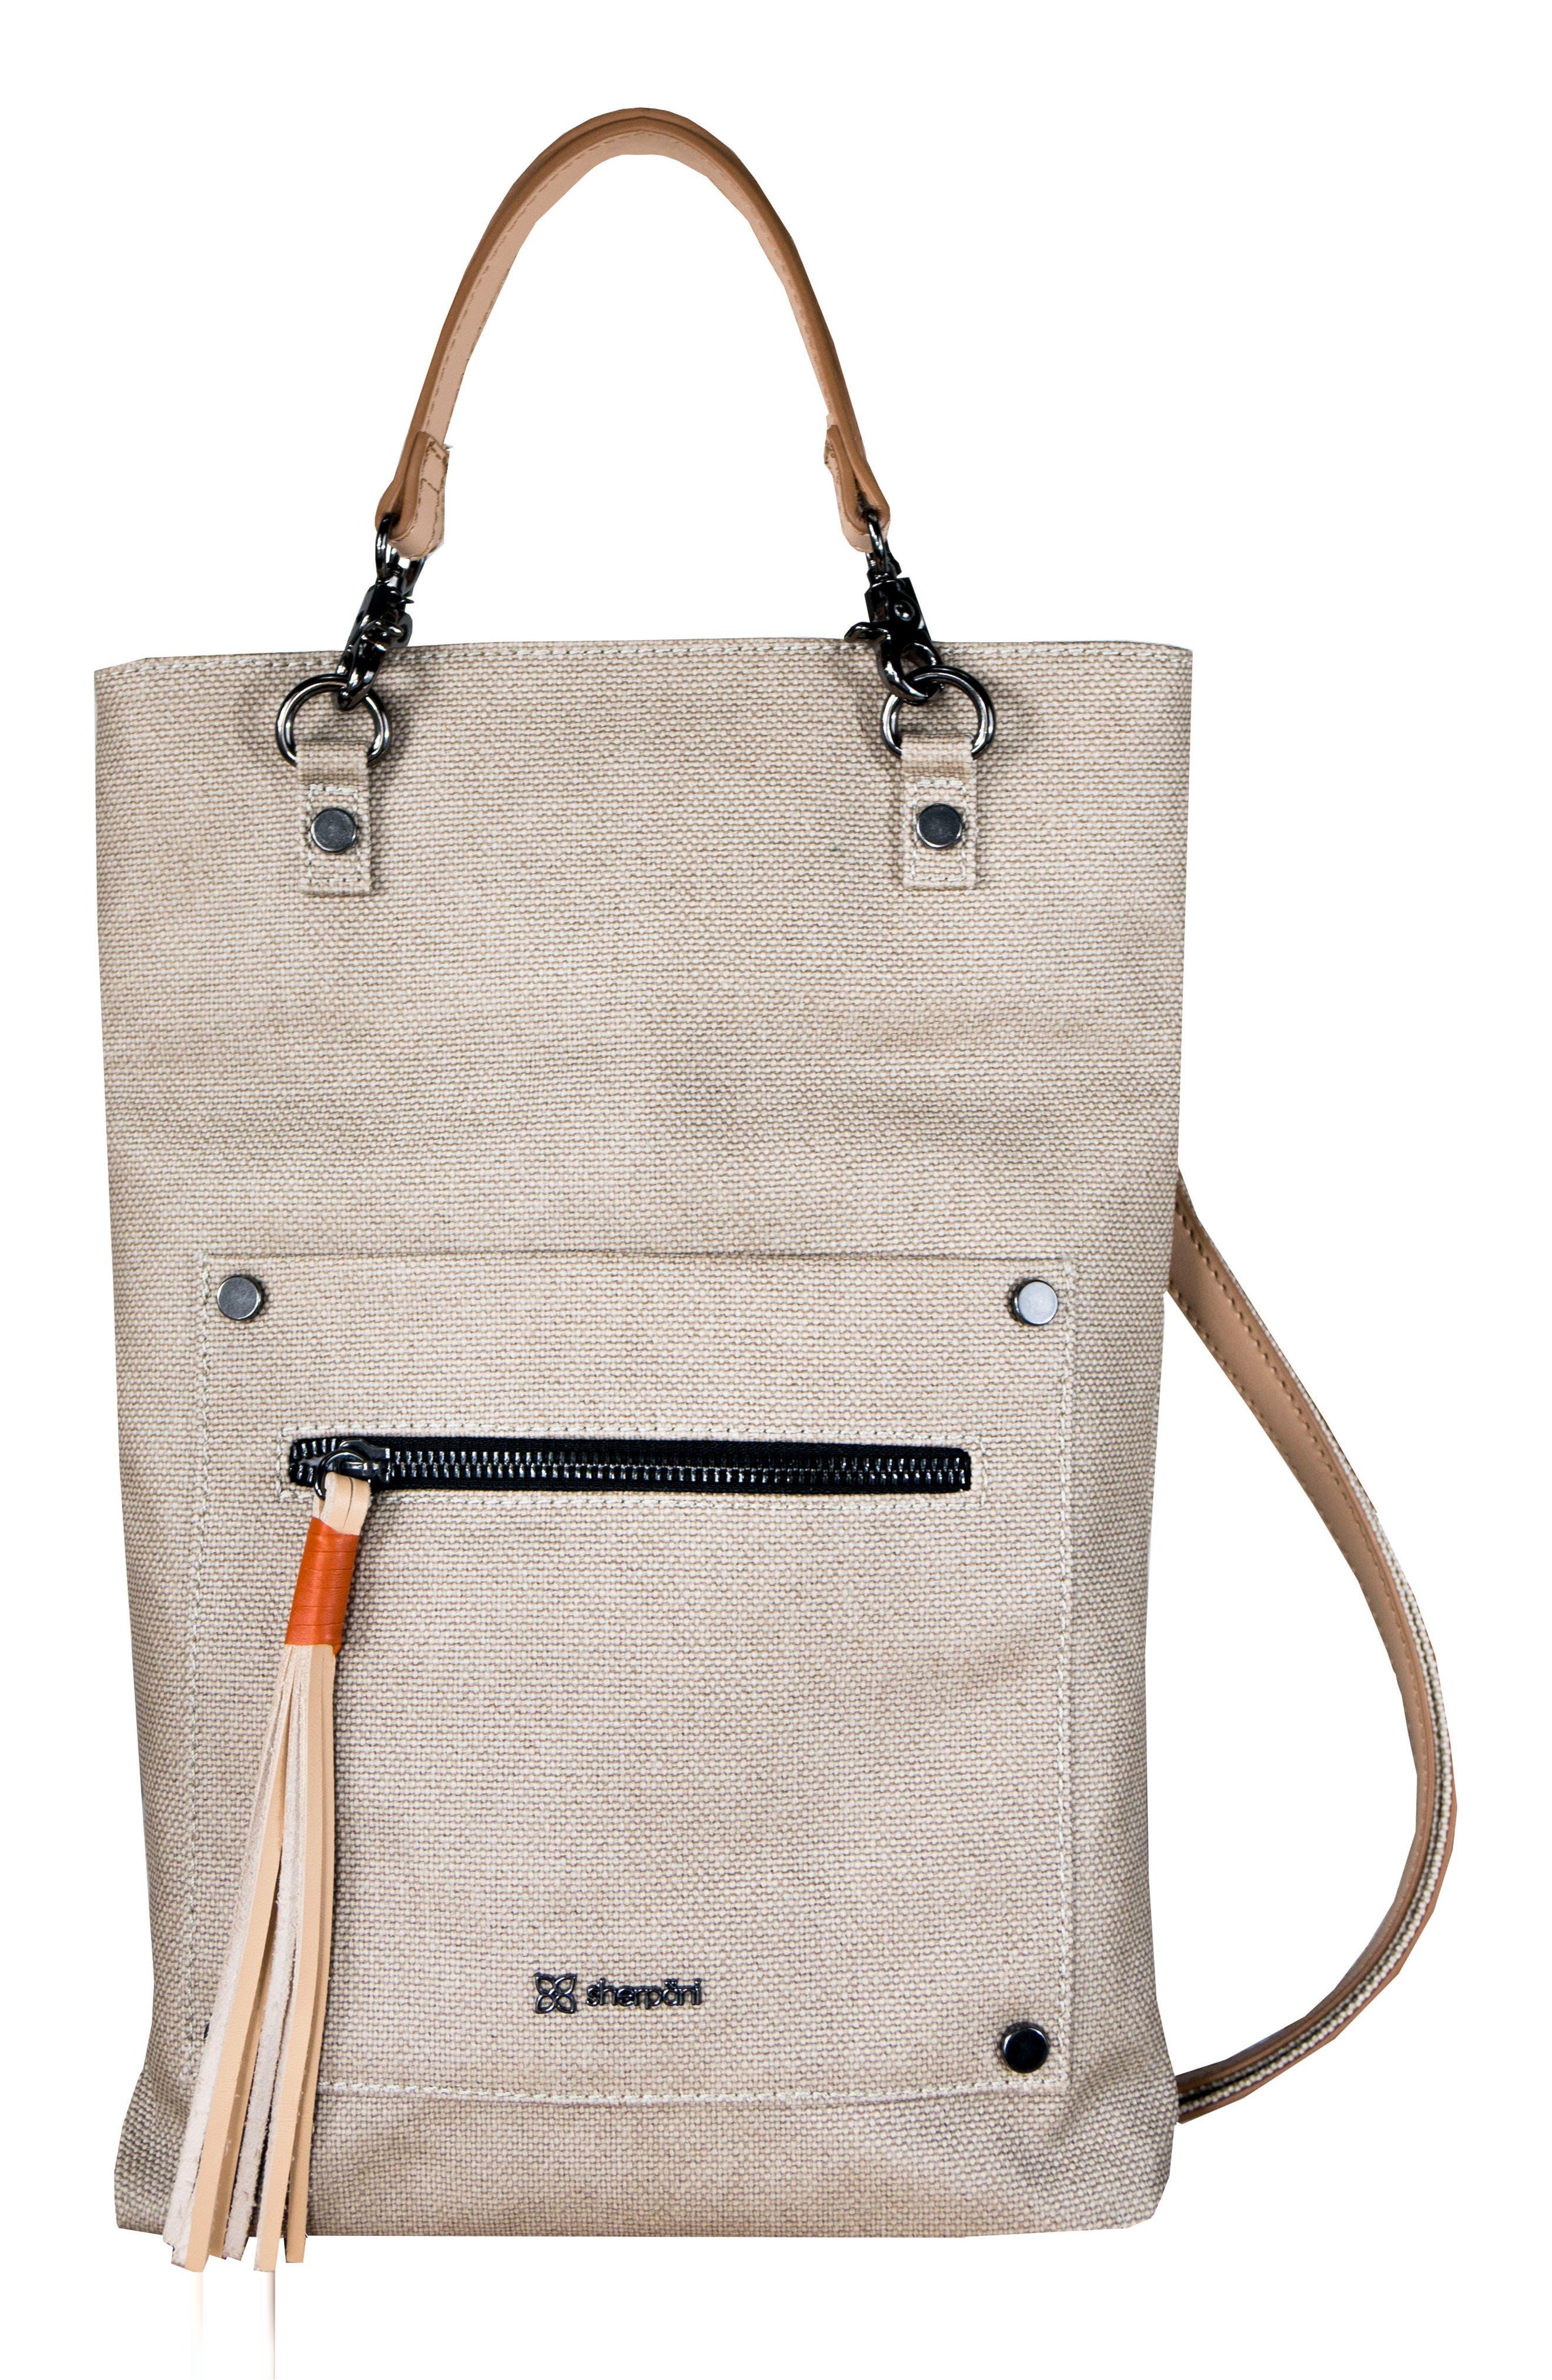 SHERPANI, Rebel Coated Canvas Crossbody Bag, Alternate thumbnail 4, color, NATURAL